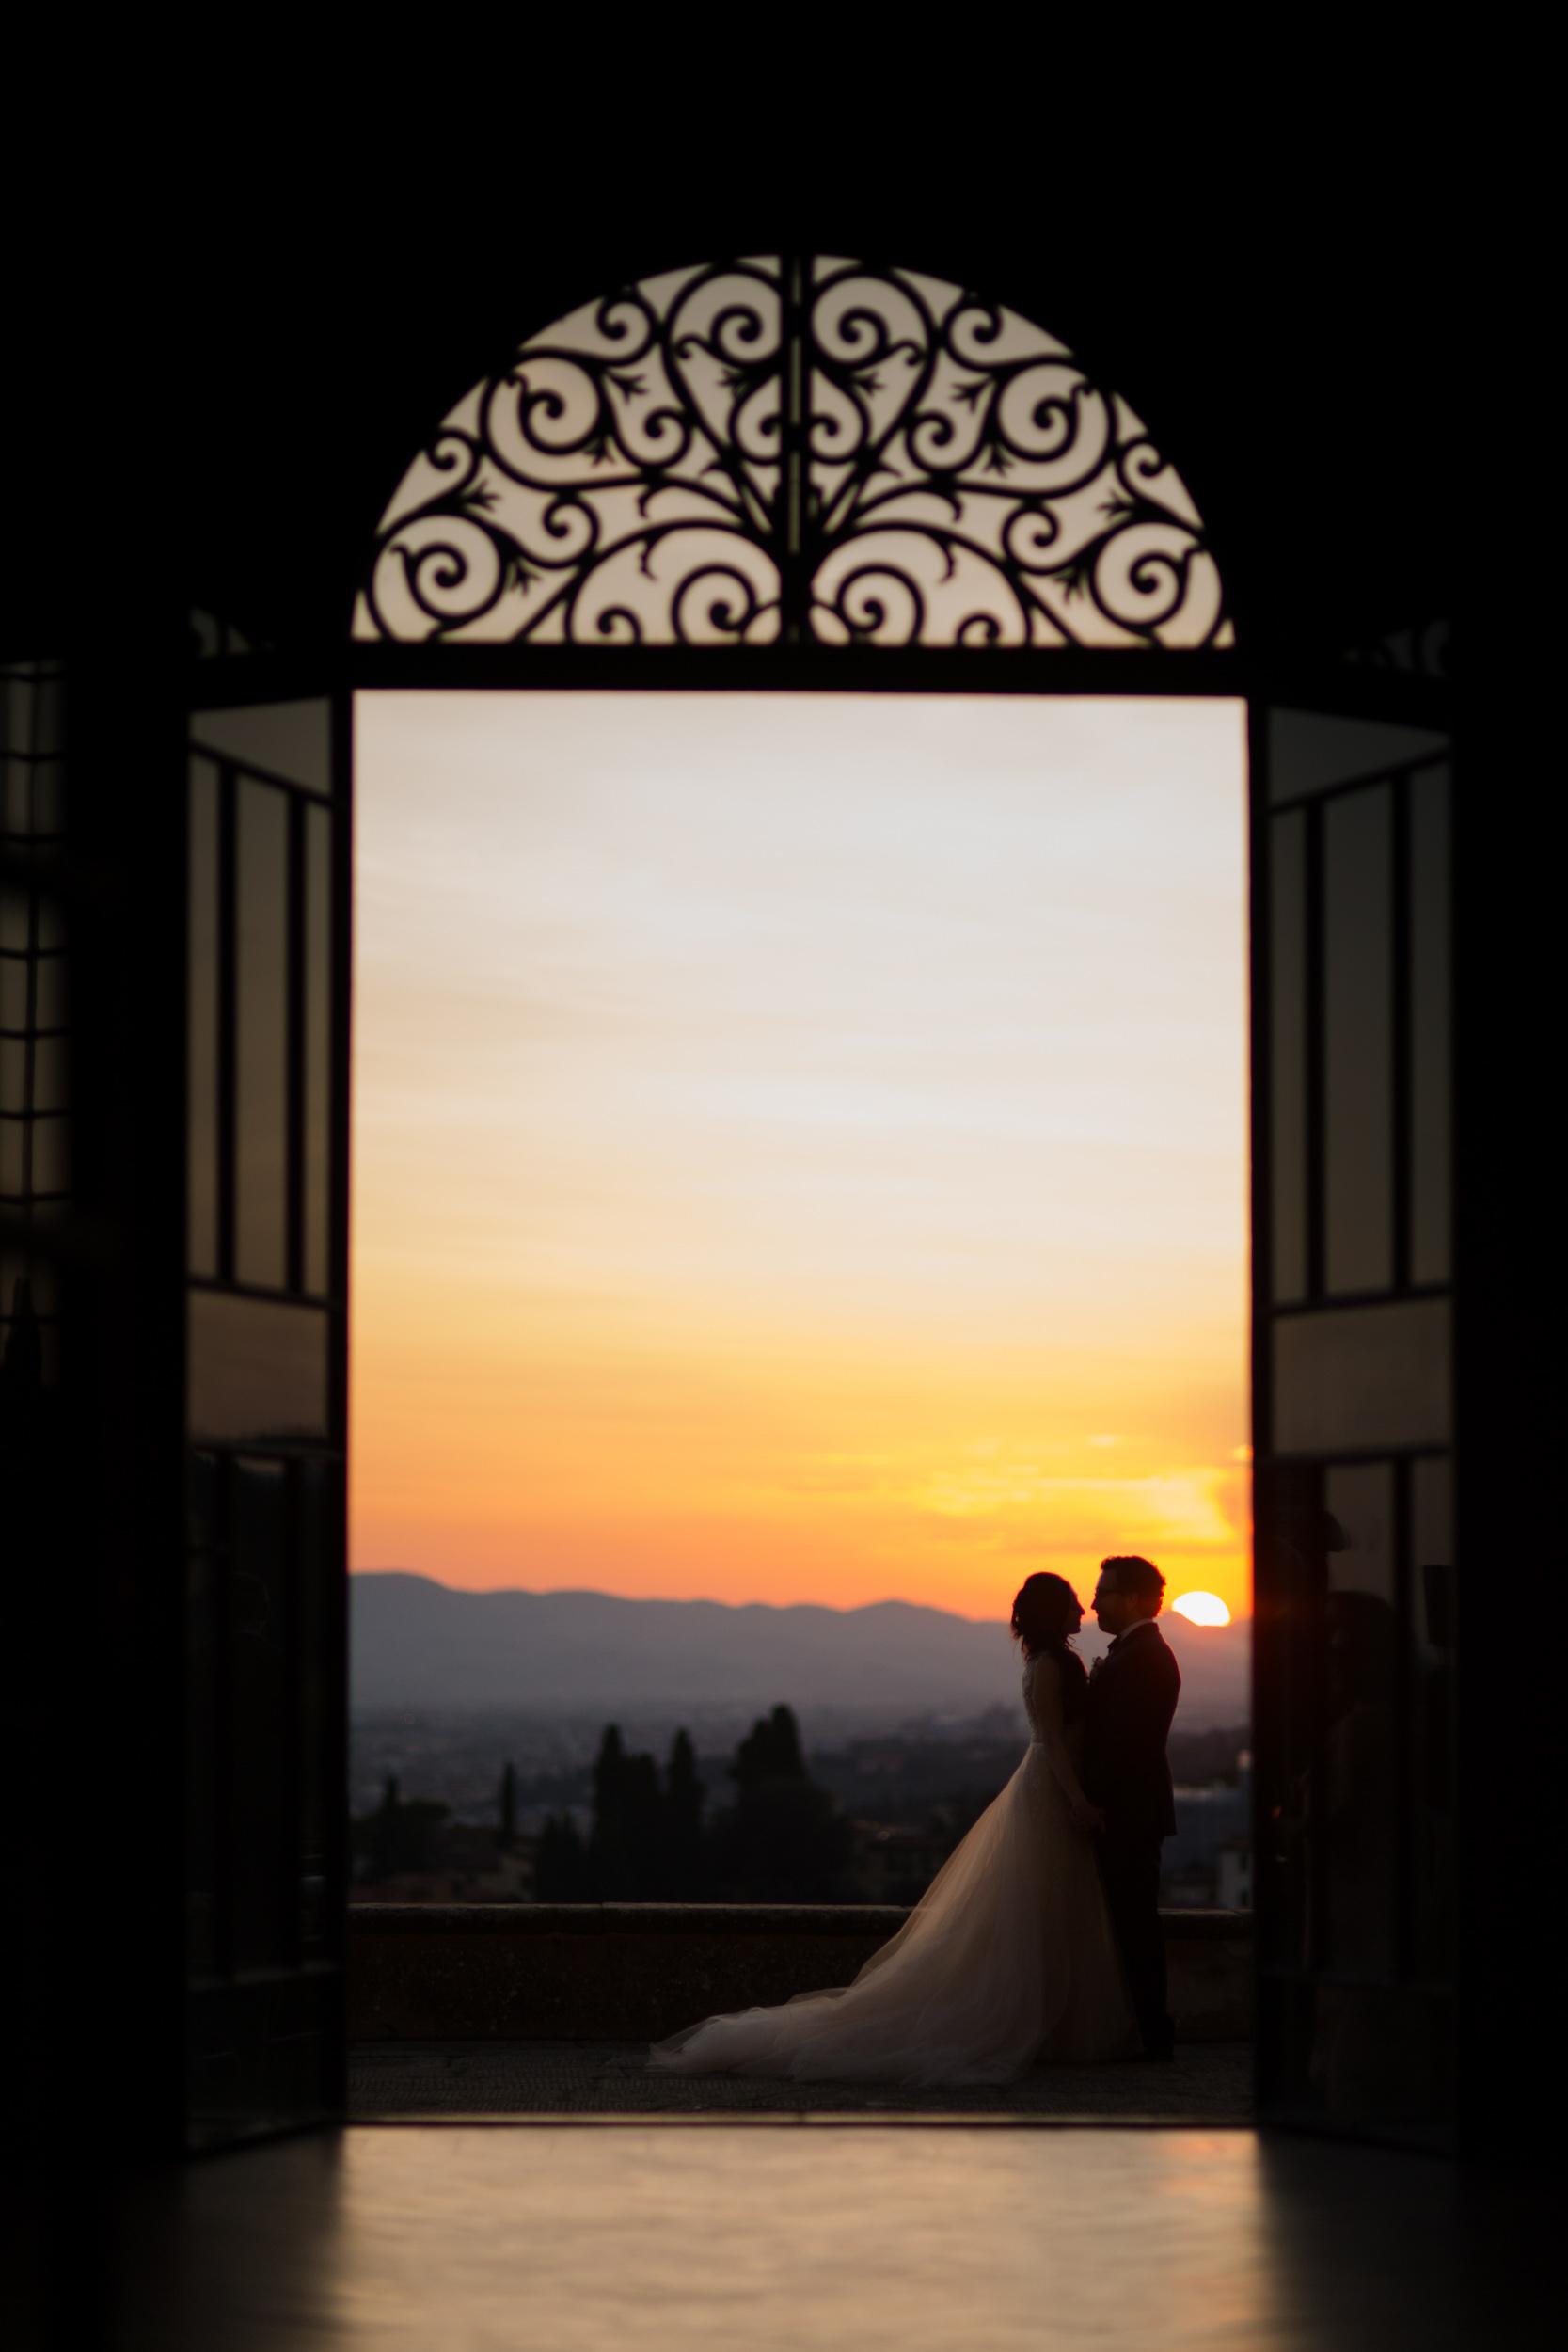 villa-gamberaia-florence-italy-destination-wedding-1-2.jpg